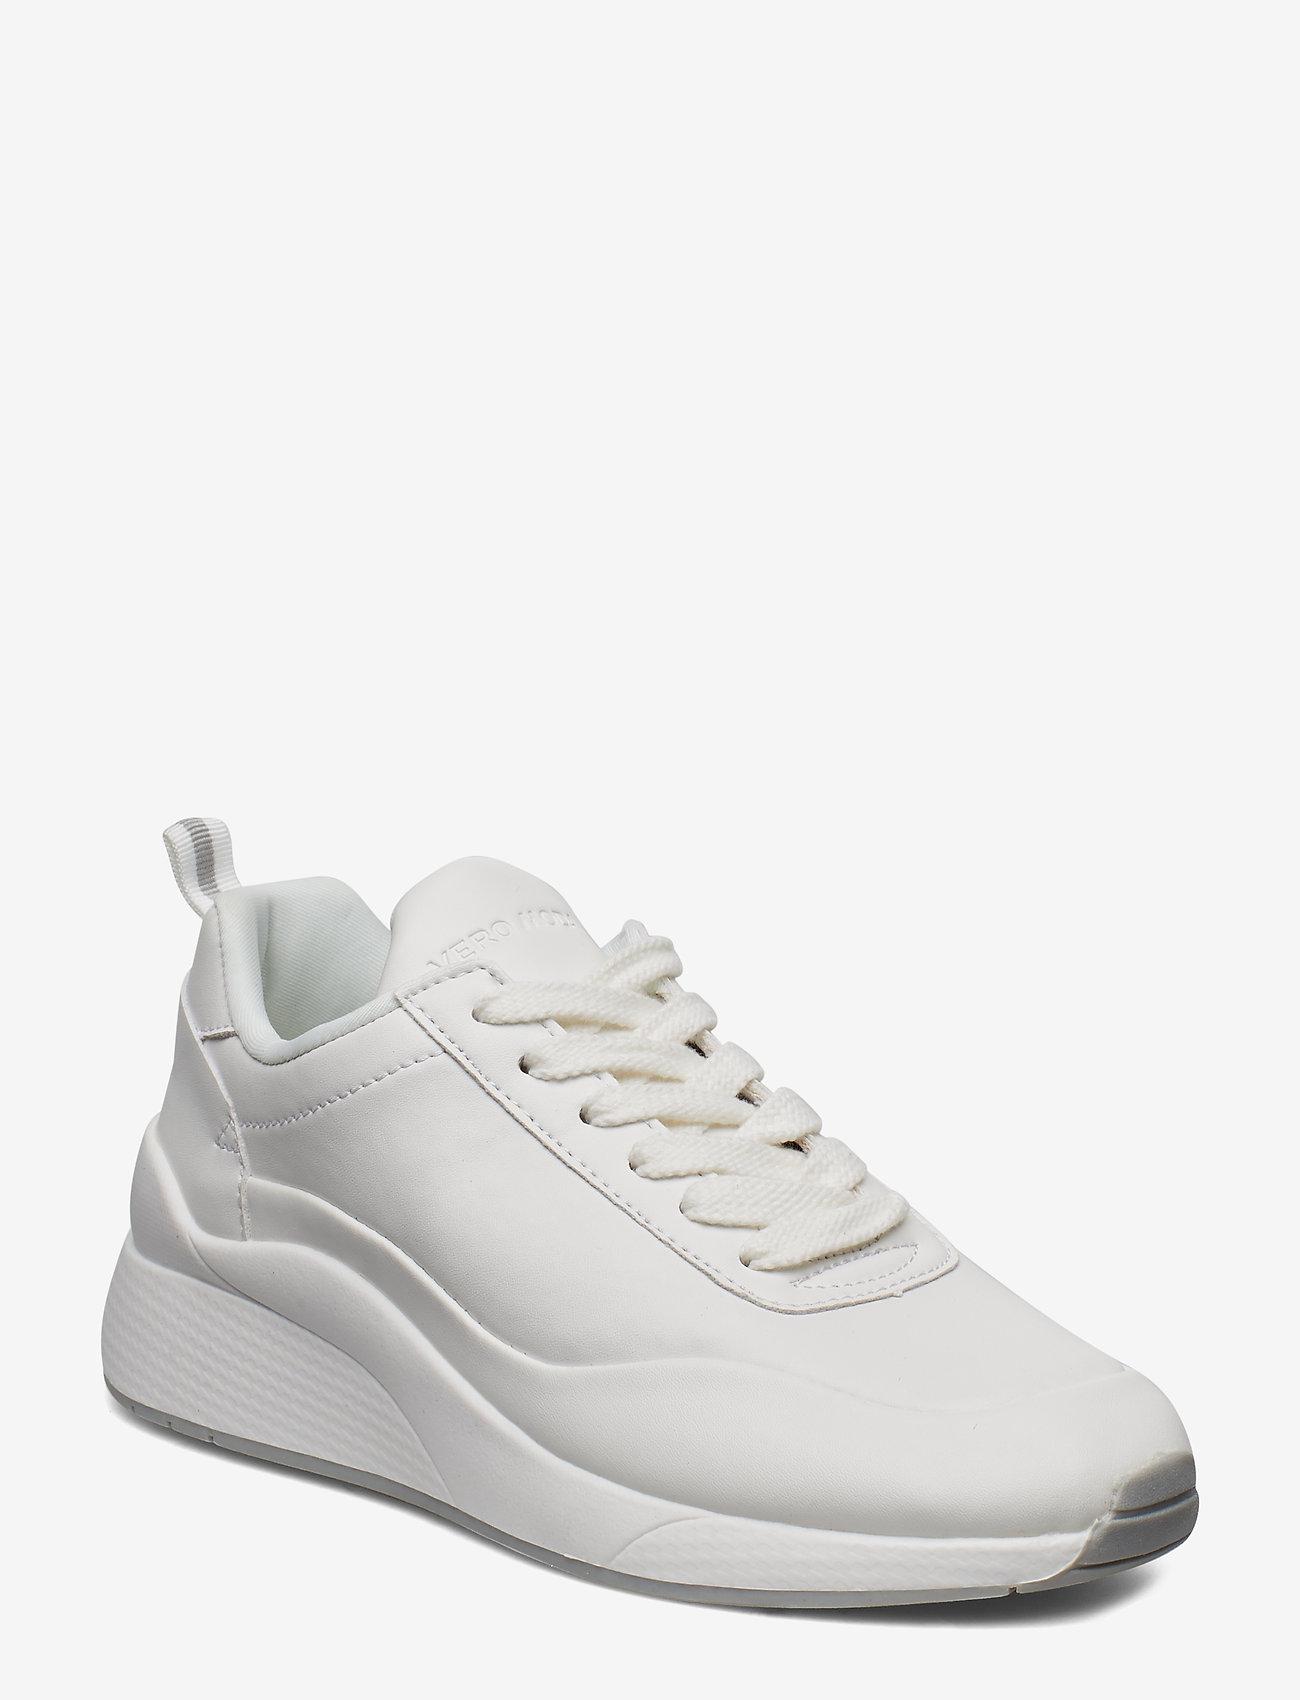 Vero Moda - VMALMA SNEAKER - låga sneakers - snow white - 0